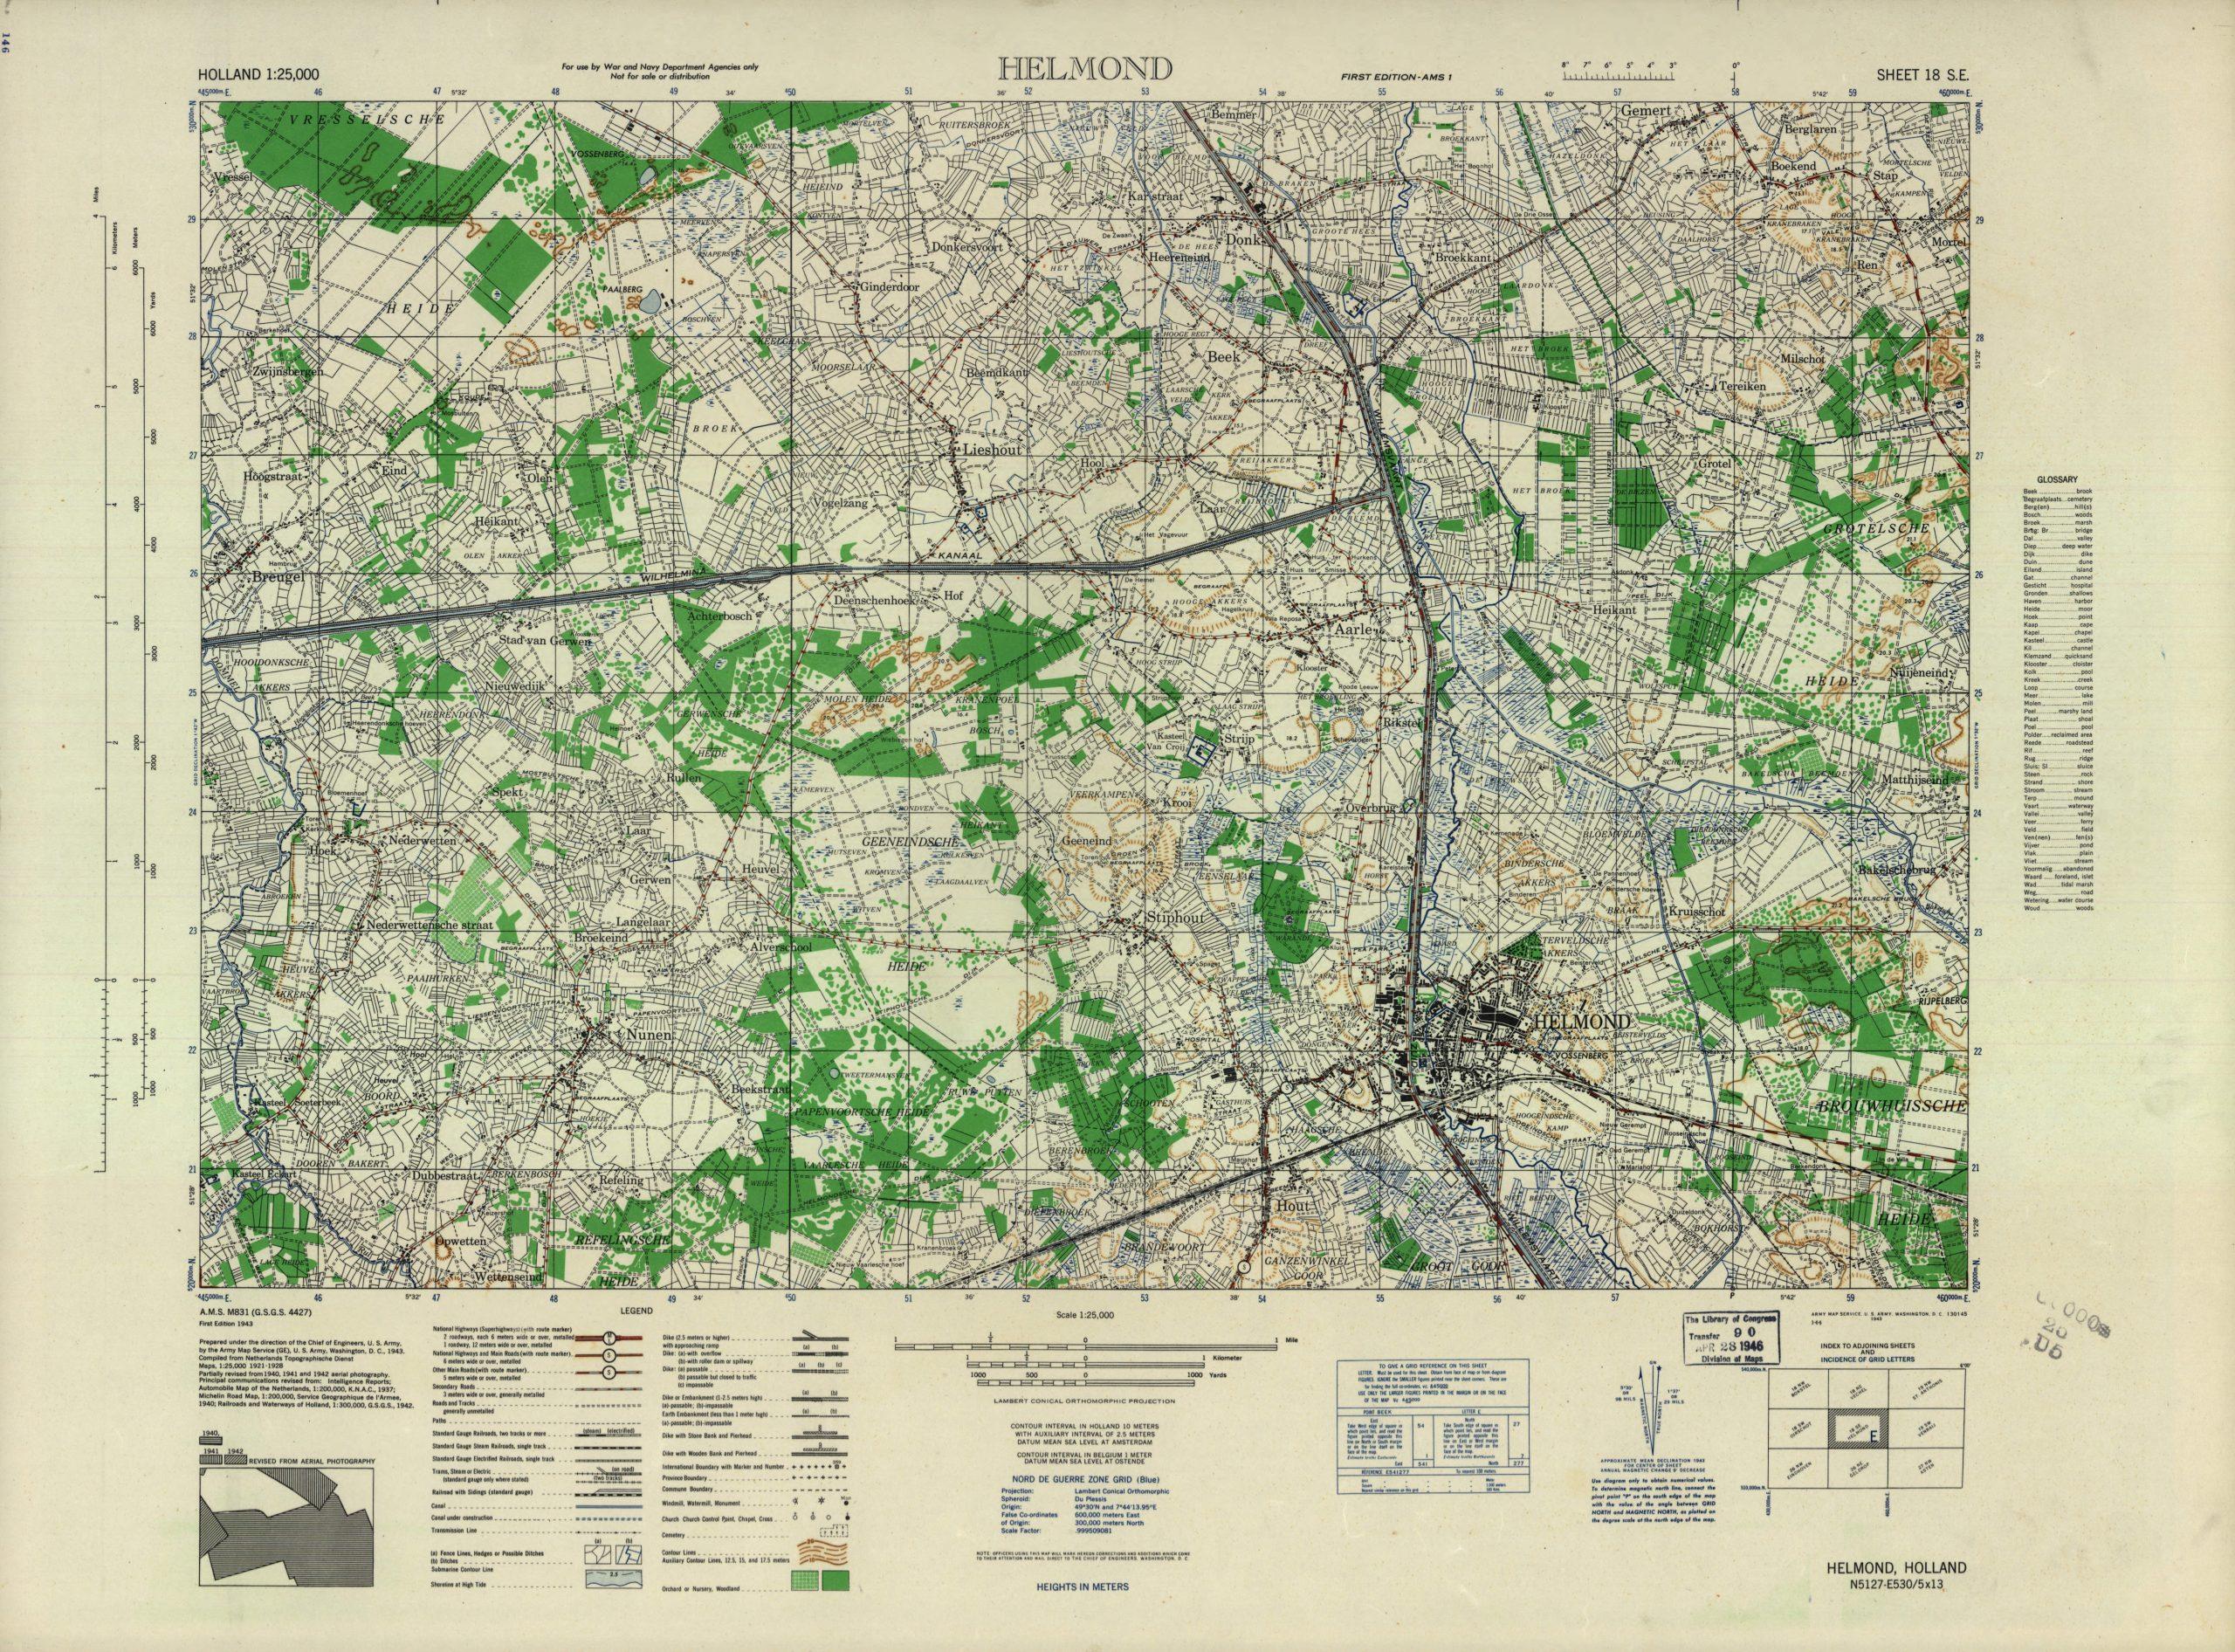 032B - GSGS-4427 - Helmond